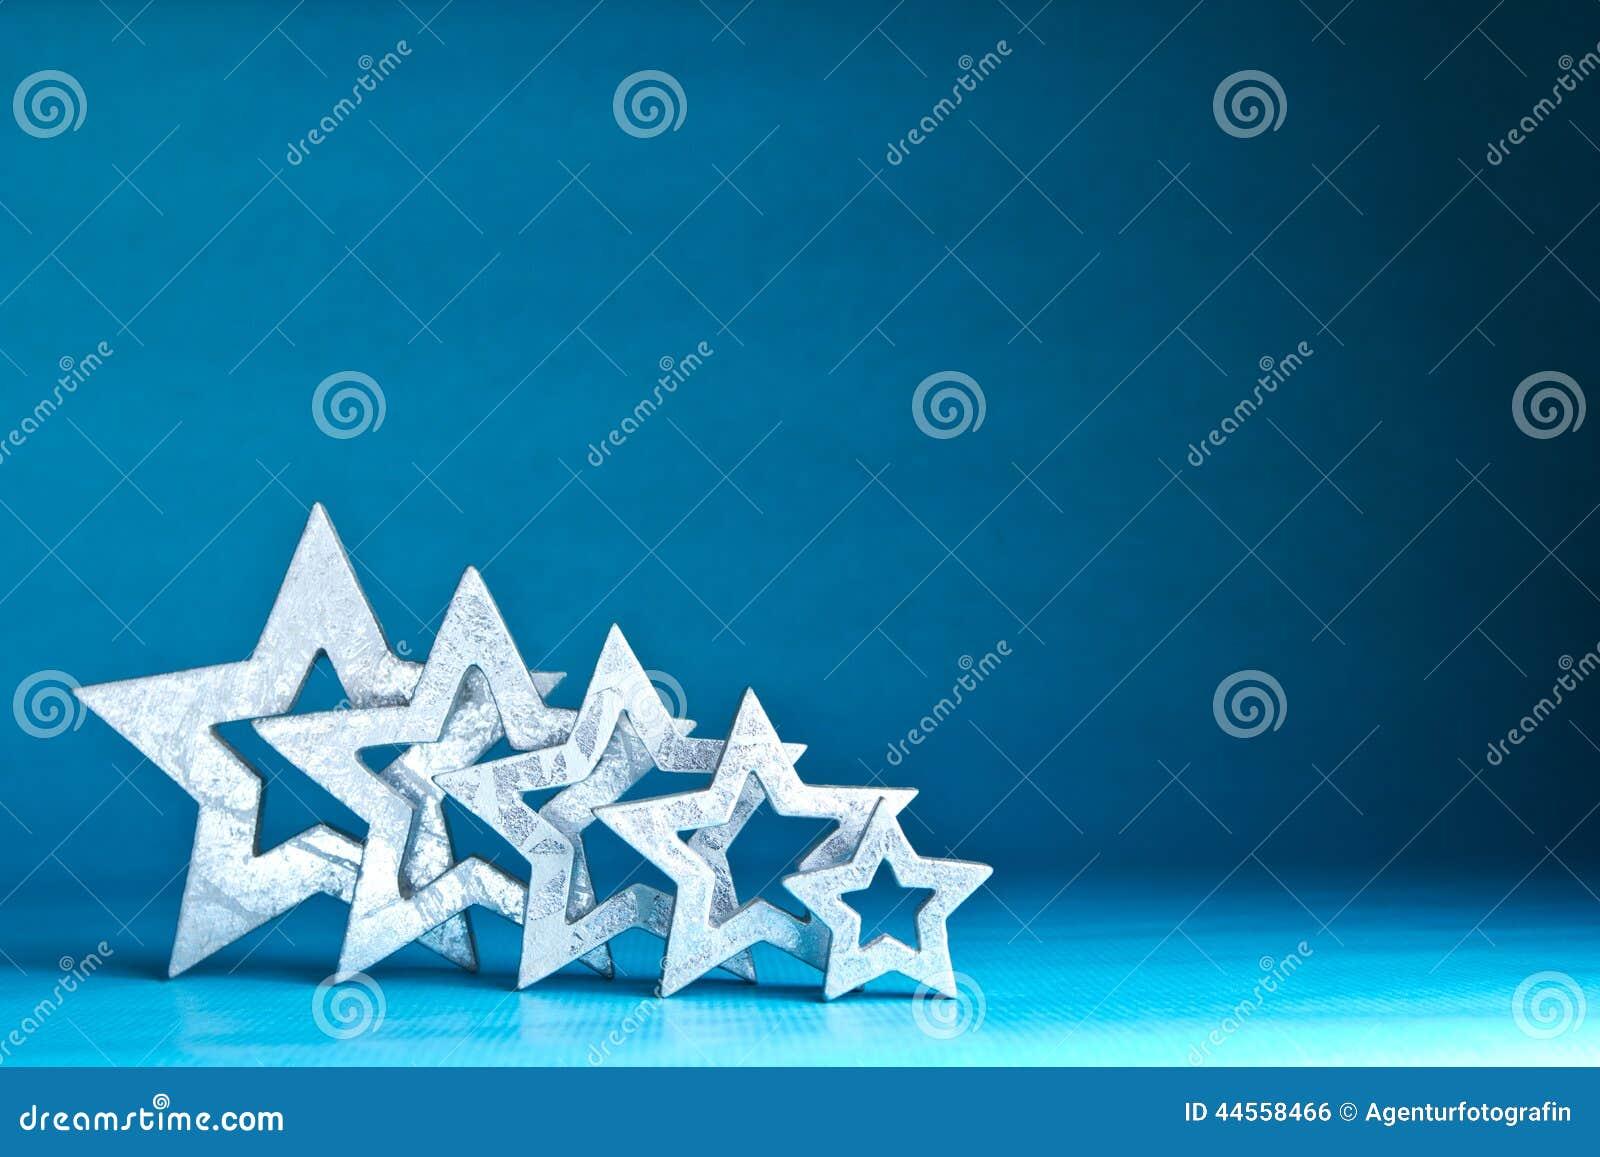 turquoise stars backgrounds - photo #20